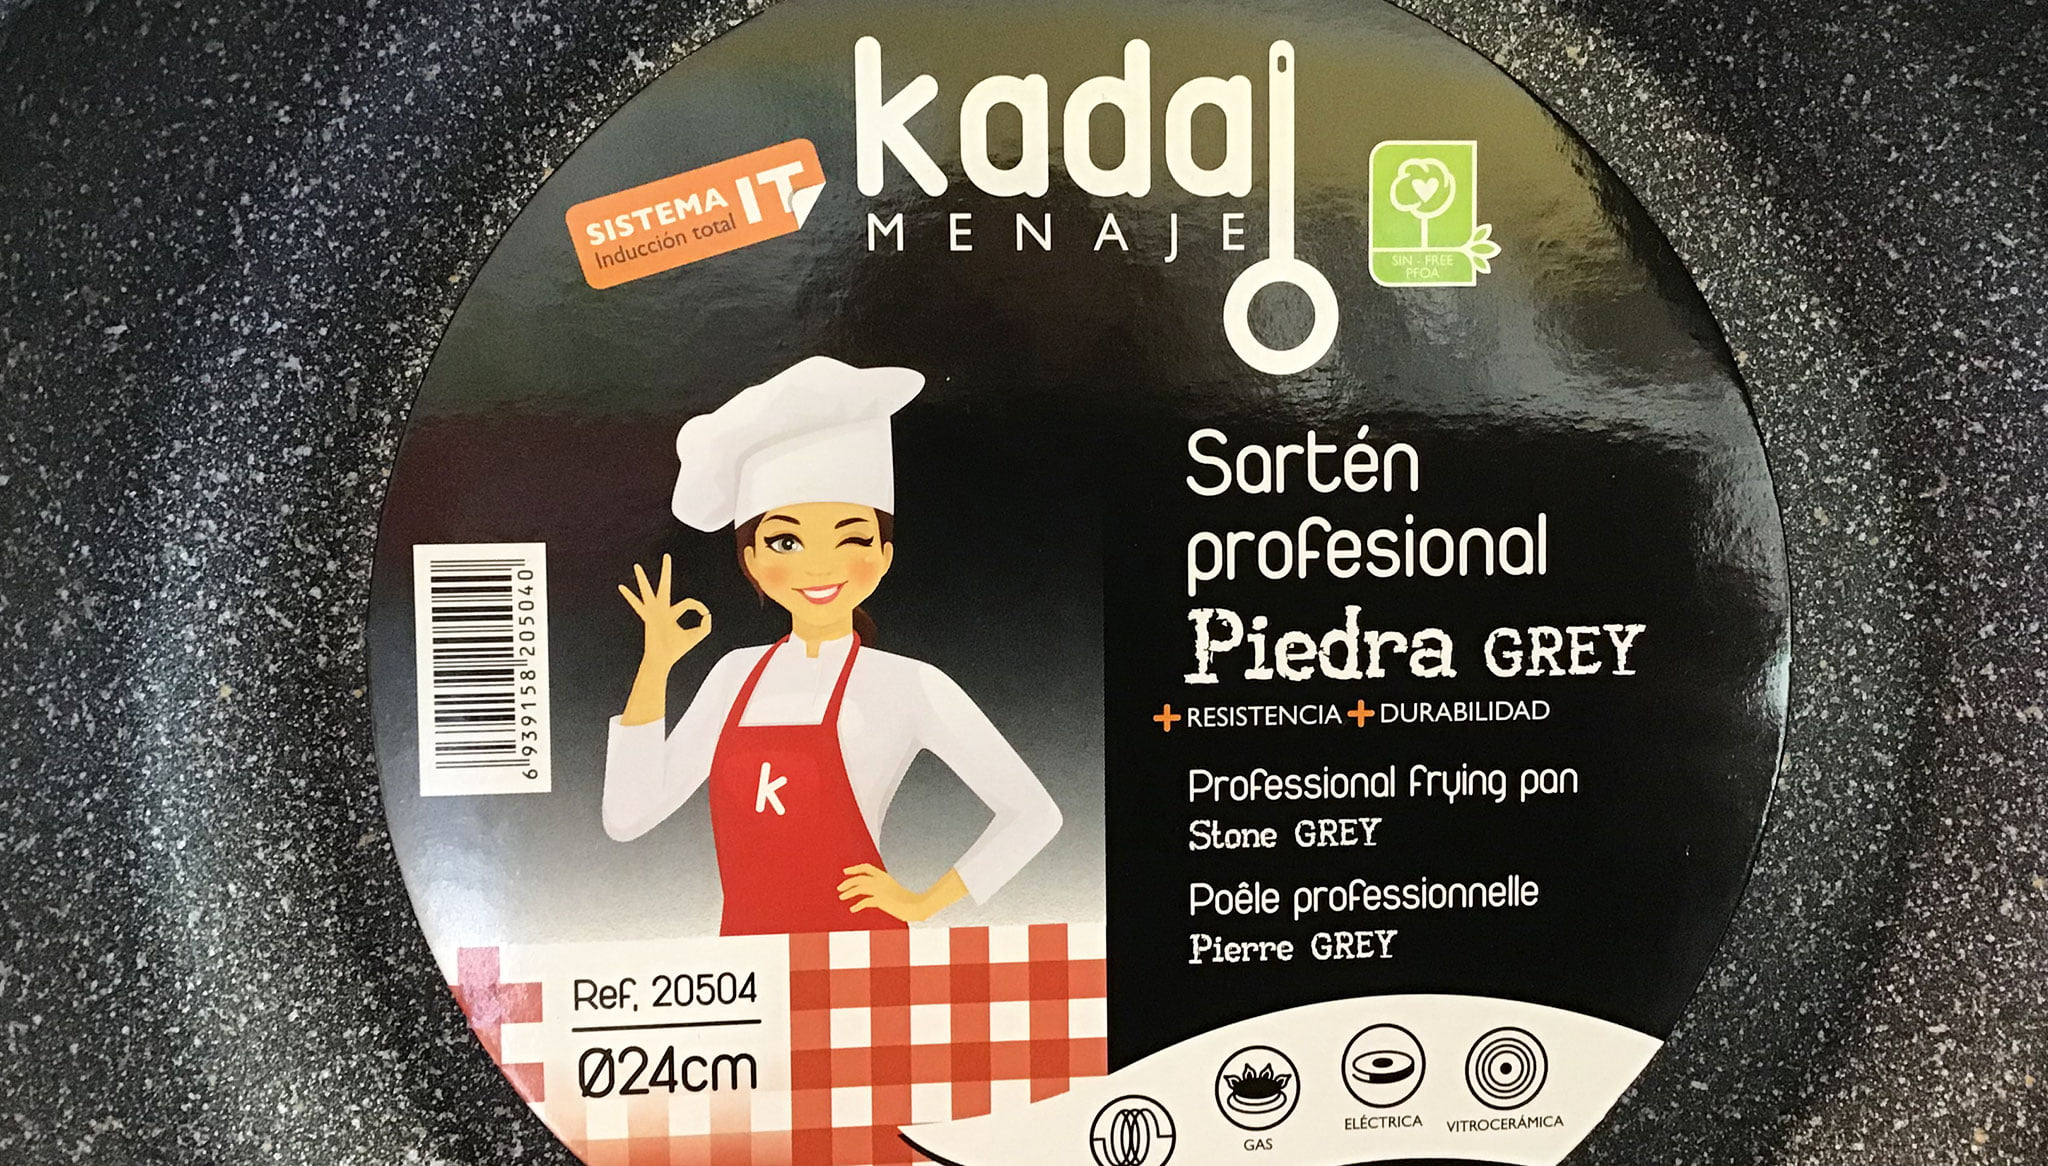 Sartén profesional de la marca Kadal Menaje en Coloma 2 Ferreteros